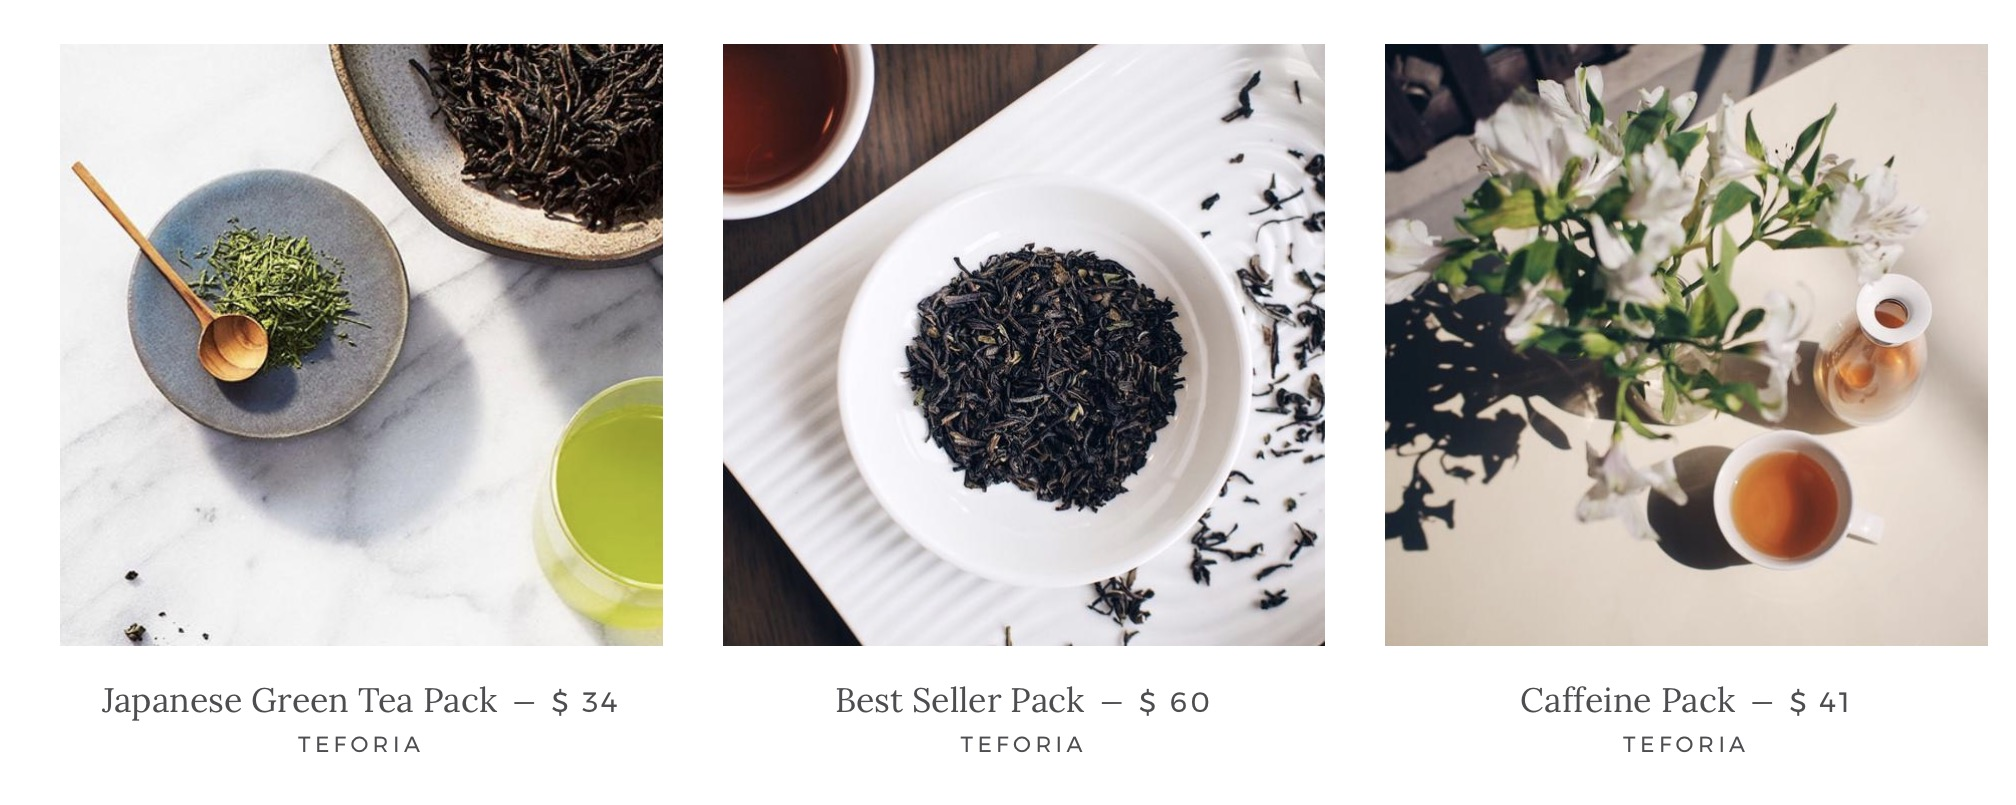 Teforia Leaf thé